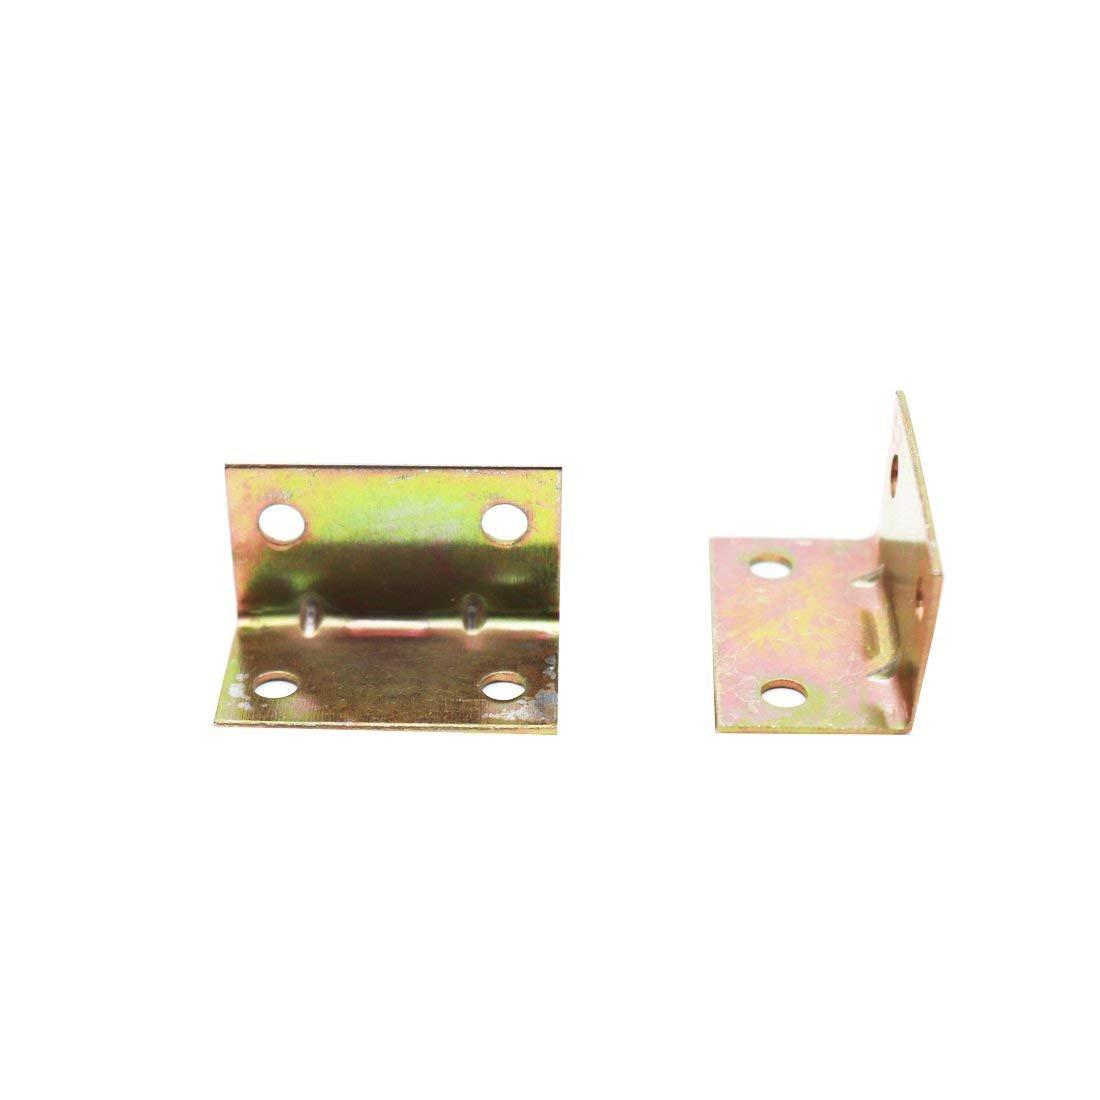 ZXHAO 17x17x30mm 0.67x0.67x1.18 inch 90 Degree Shelf Support Corner Brace 20pcs